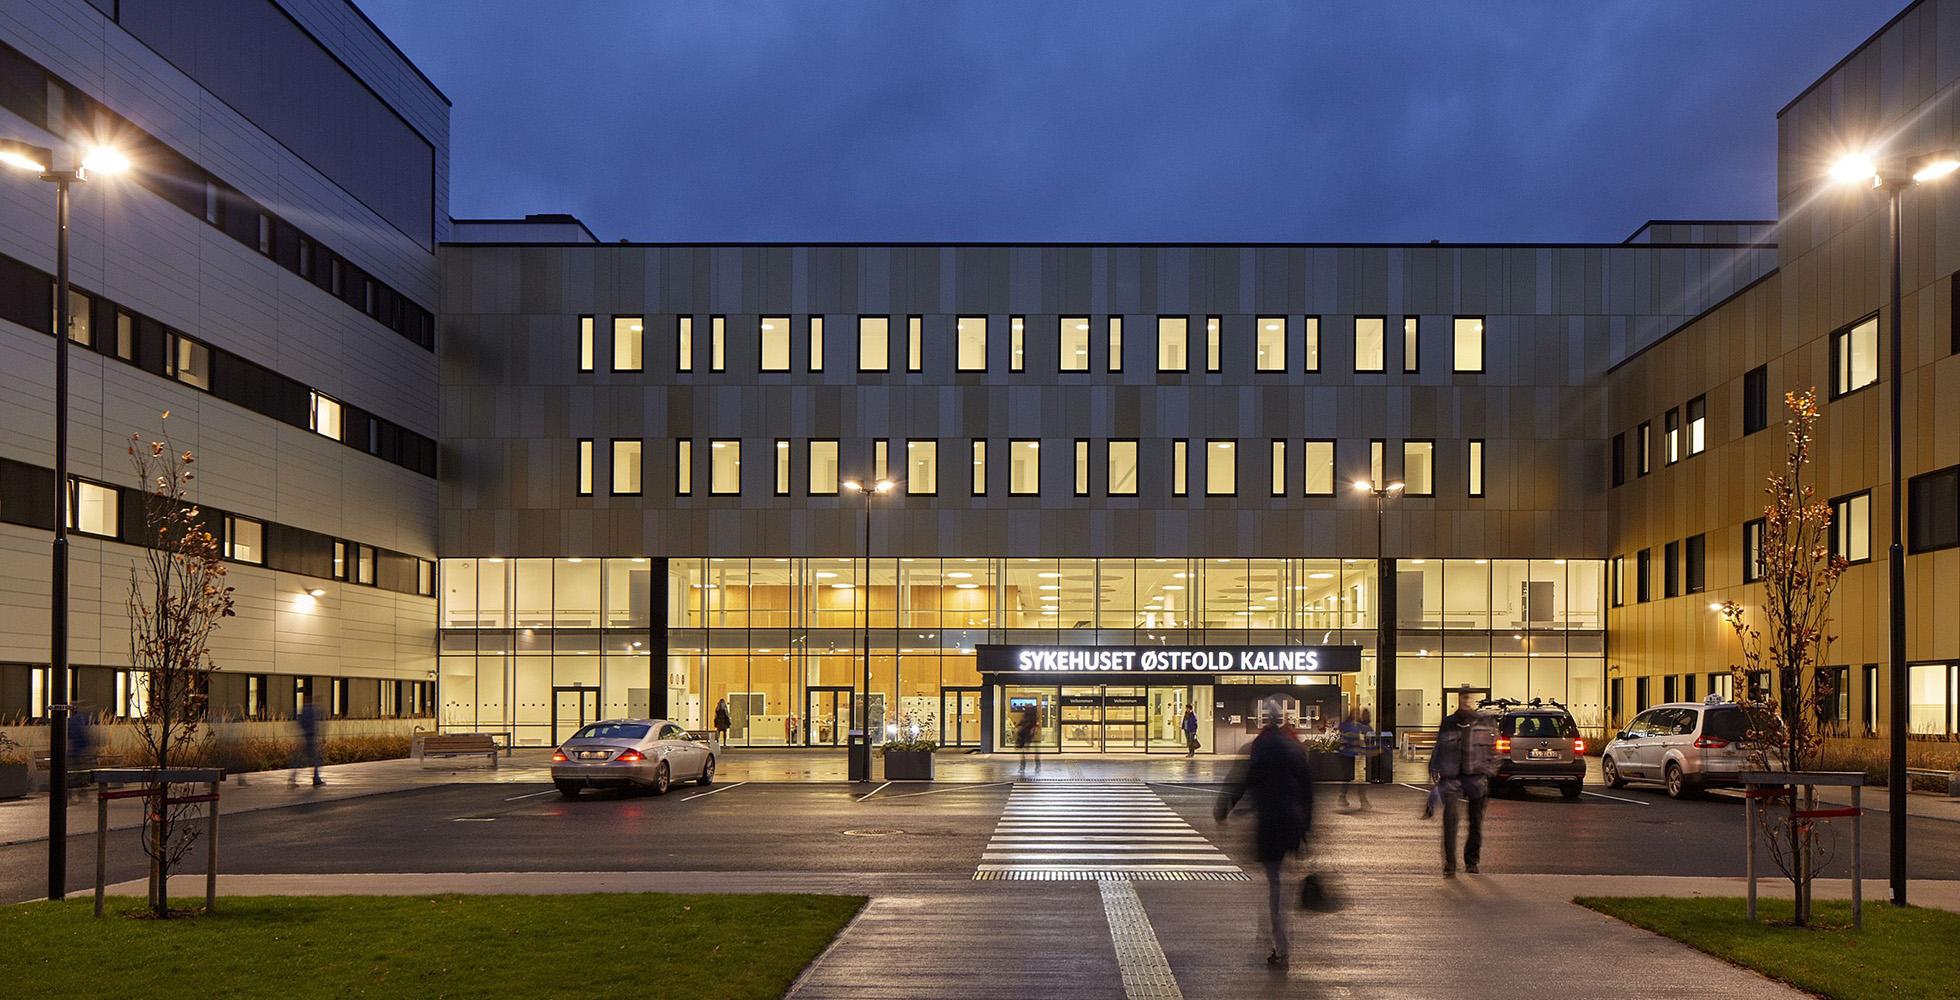 The Hospital Østfold Kalnes